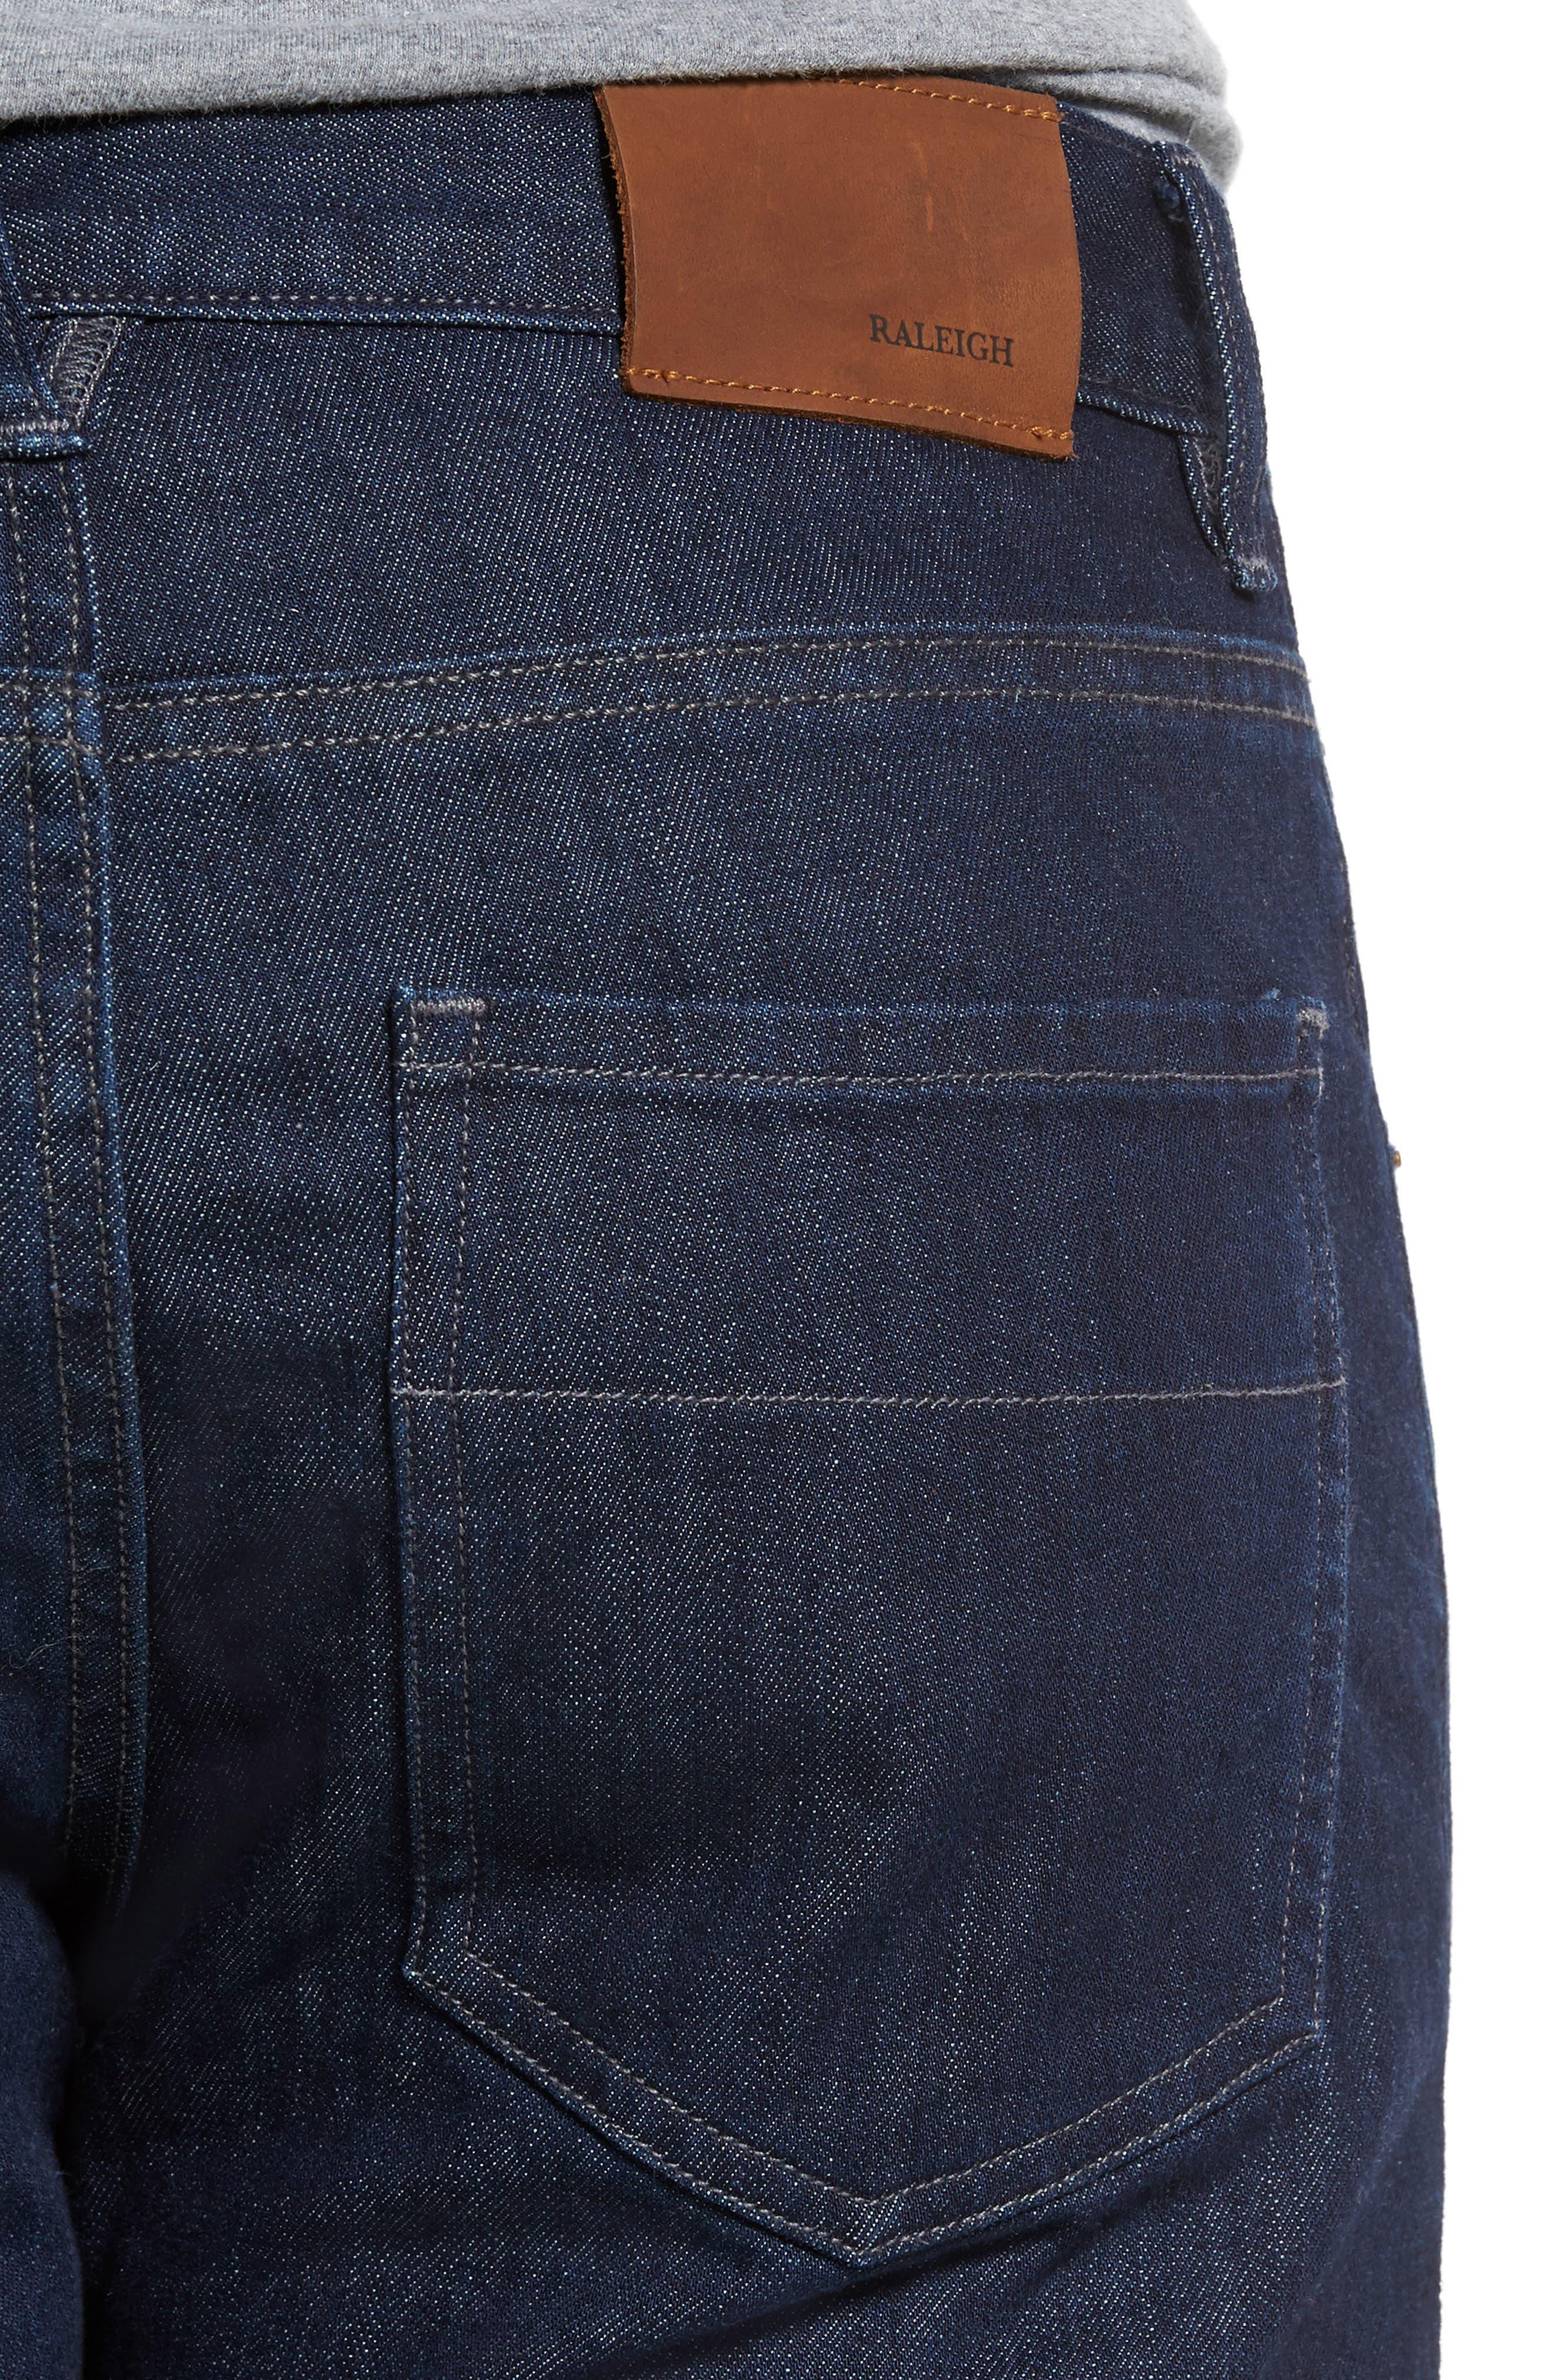 Jones Slim Fit Jeans,                             Alternate thumbnail 4, color,                             418